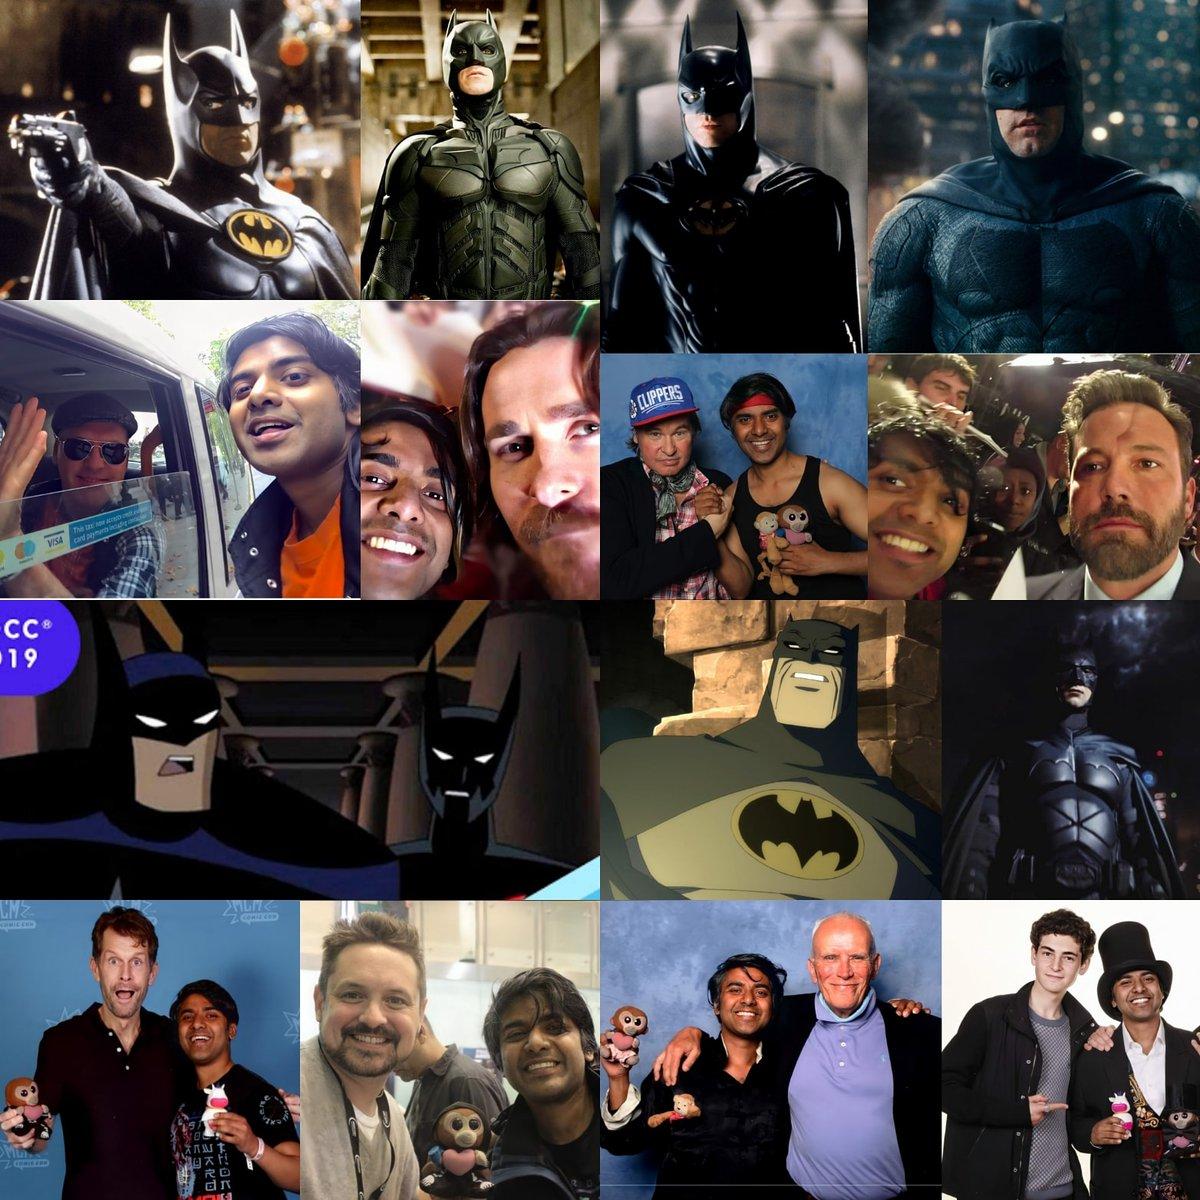 #batmanday #batman #bamantvsuperman #justiceleague #thedarkknight #tdkr #batmanforever #batman1989 #Gotham #batmanbeyond #dccomics #batmanbegins #plushies #MichaelKeaton #christianbale #BENAFFLECK #brucewayne #terrymcginnis https://t.co/GecDdZPCX9